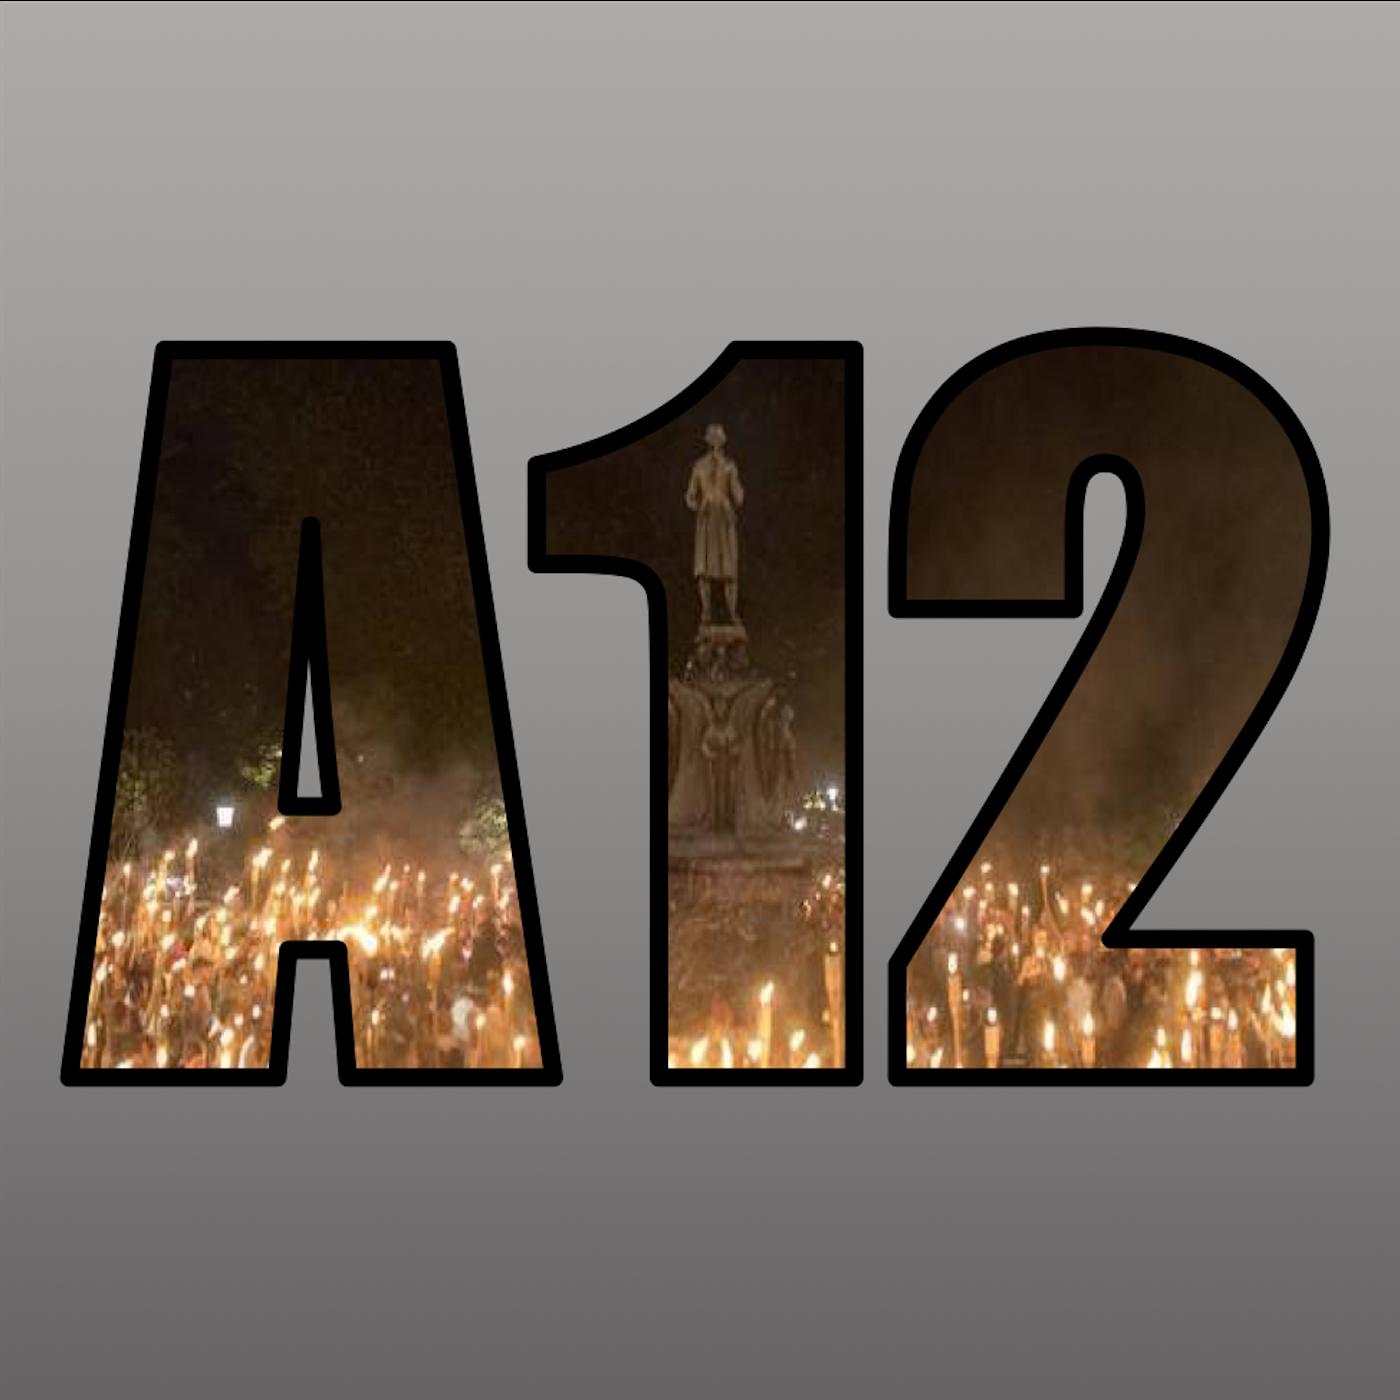 Episode 4: The Alt-Right Rises